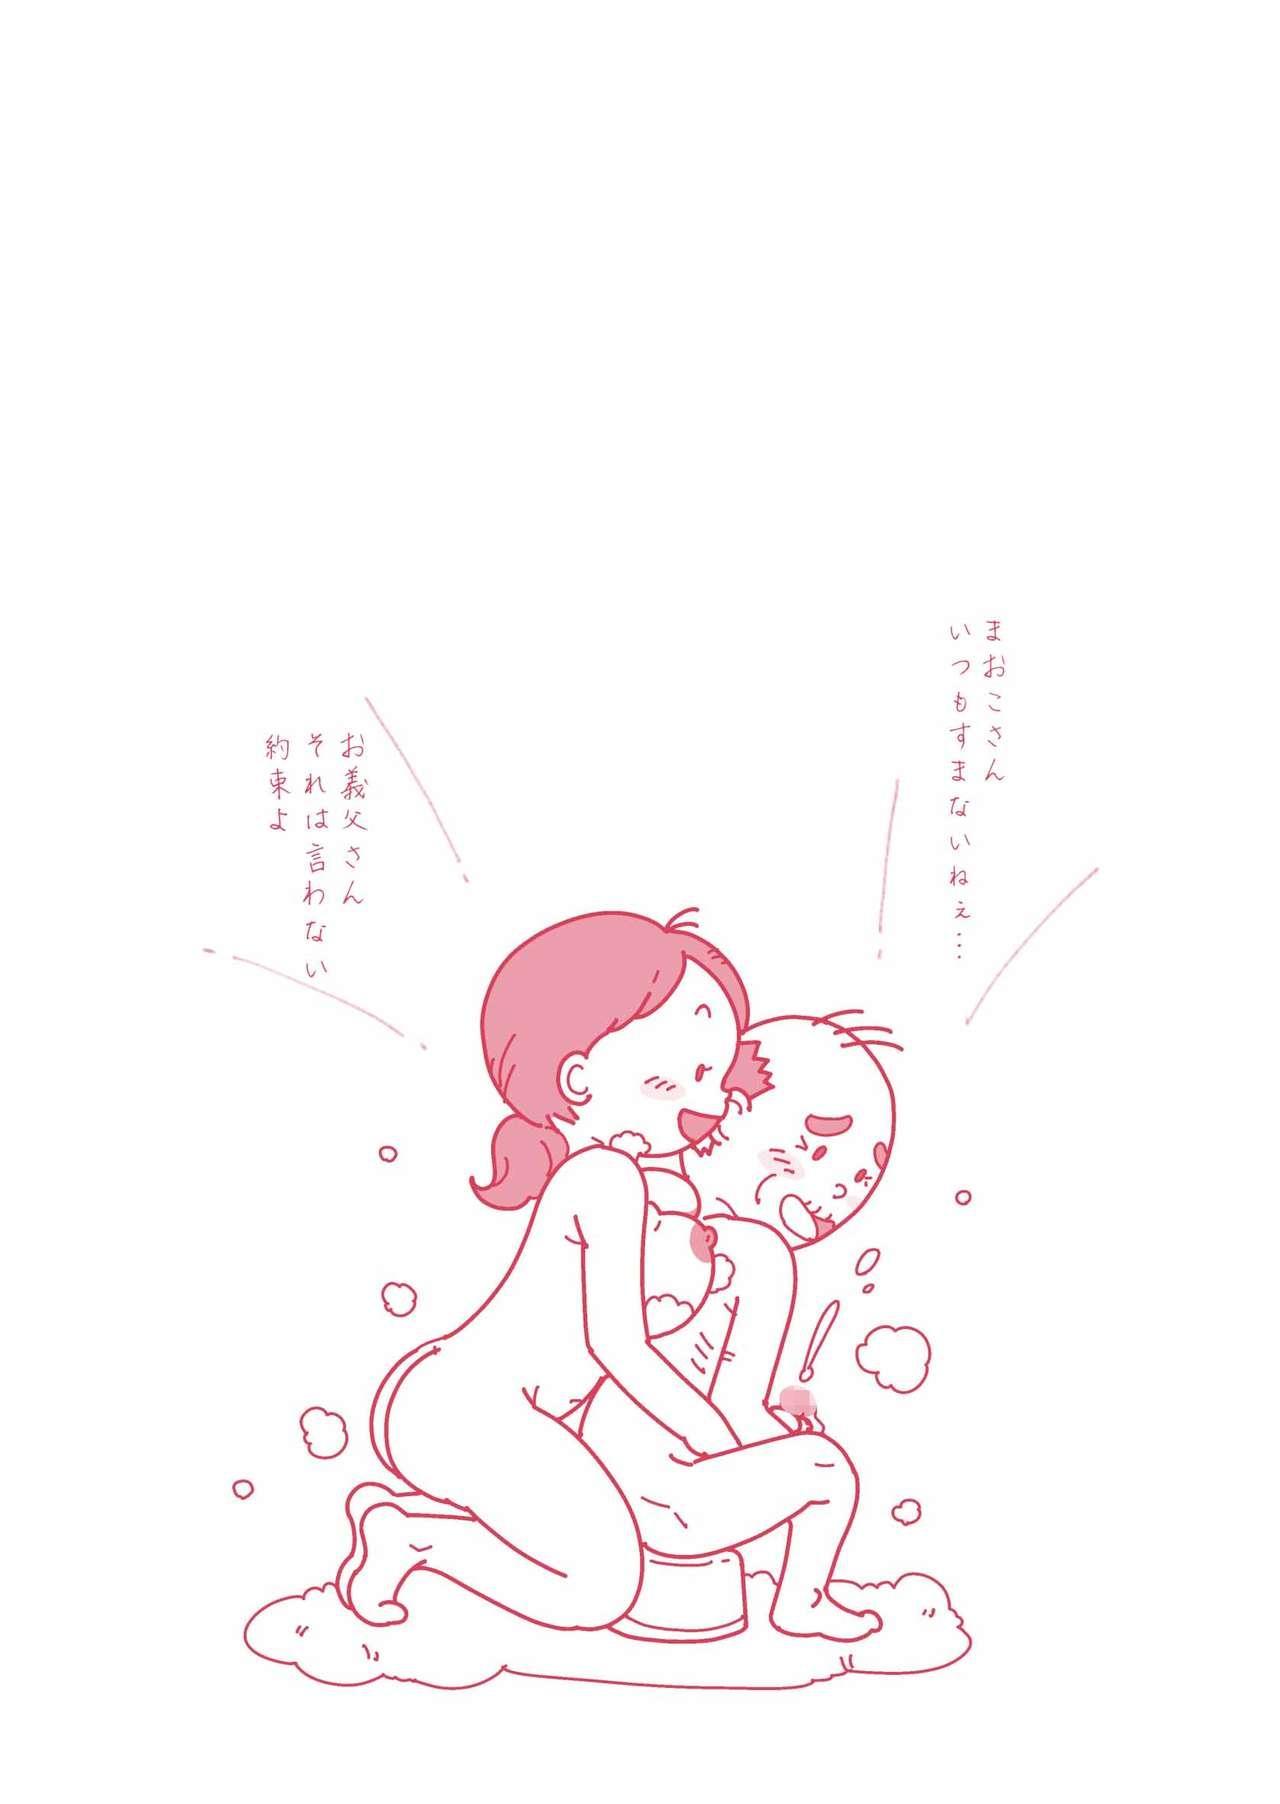 Isogasii Okaasan No Tamuno Sasa Rouzin Seikaigo | Guide for Elderly Sex Health Care to Busy Mom 4